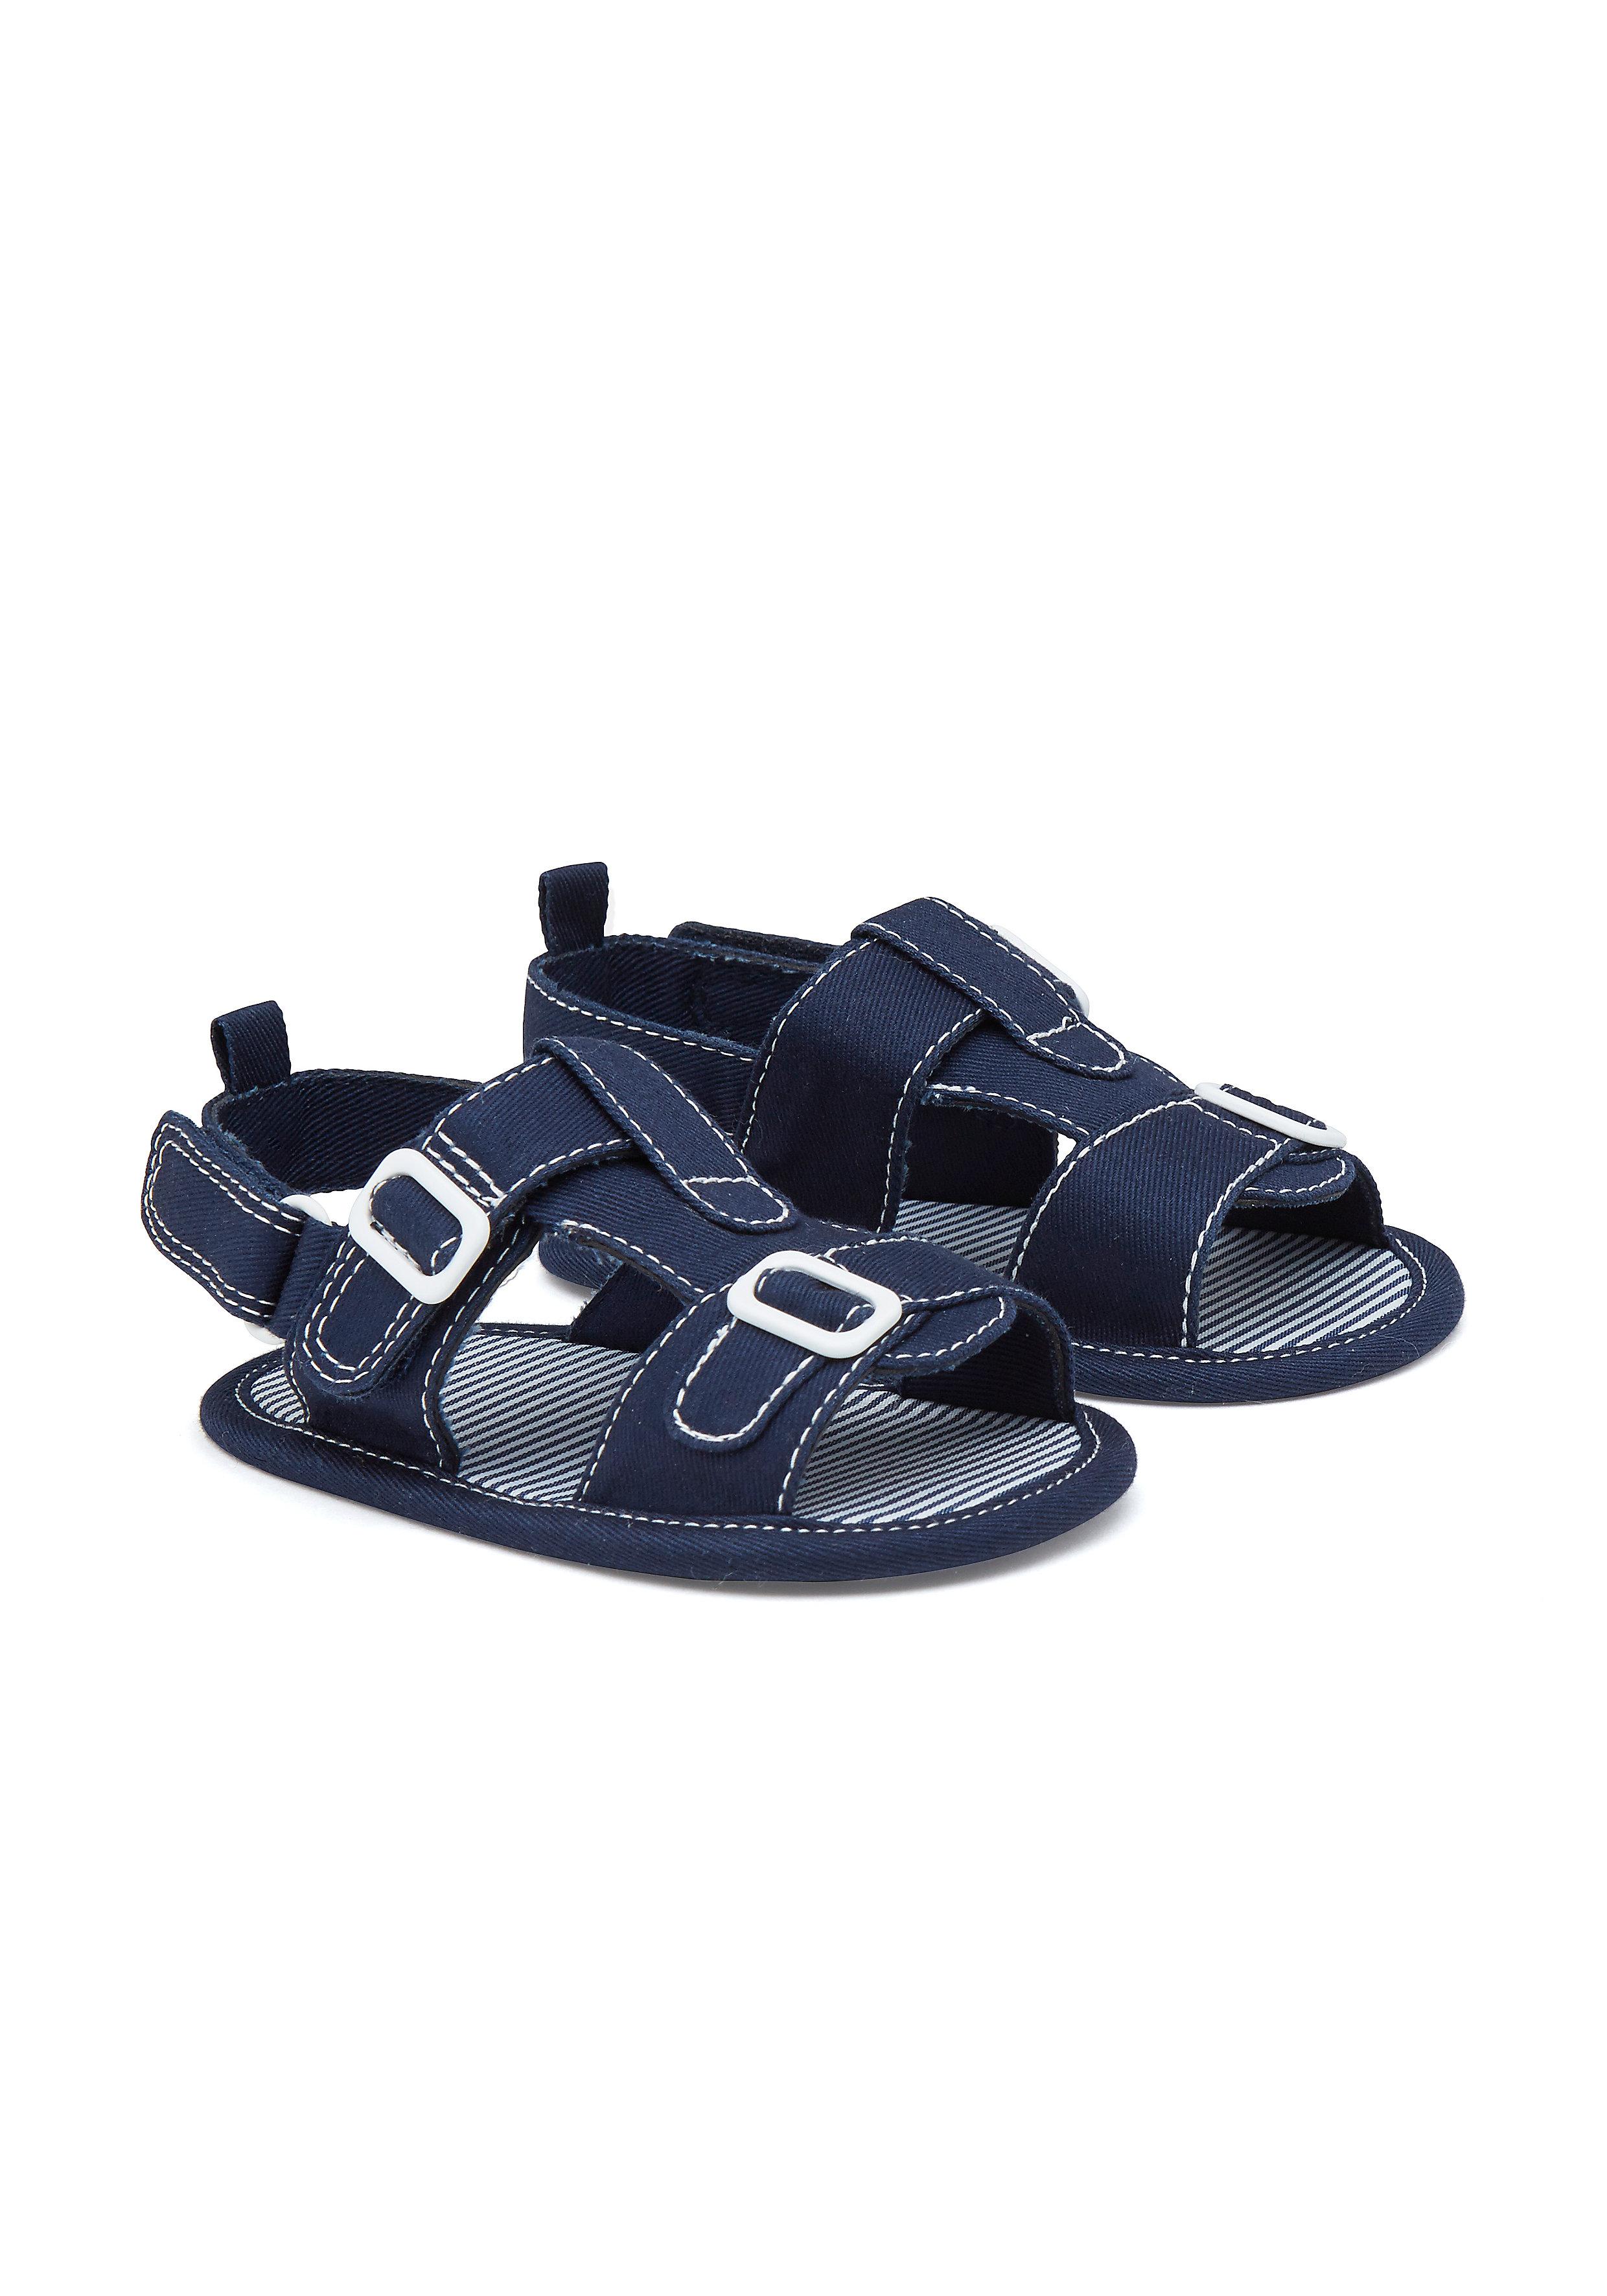 Mothercare | Boys Smart Buckle Sandals - Navy